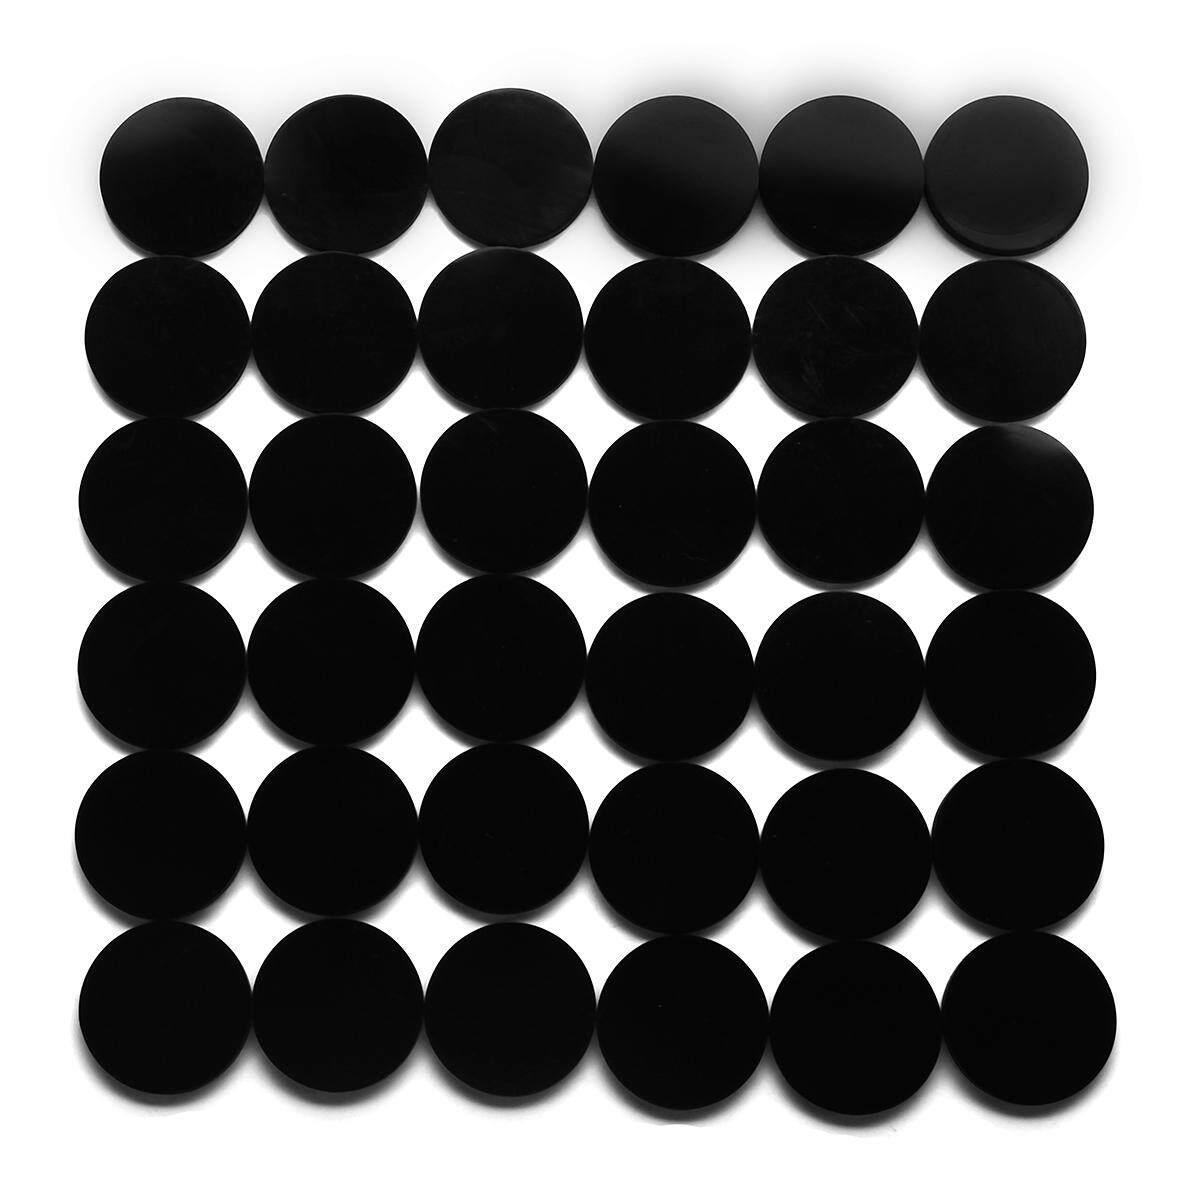 New 100 Pcs 25mm Round Bases Black Antiskid Silico Model Bases For Wargames